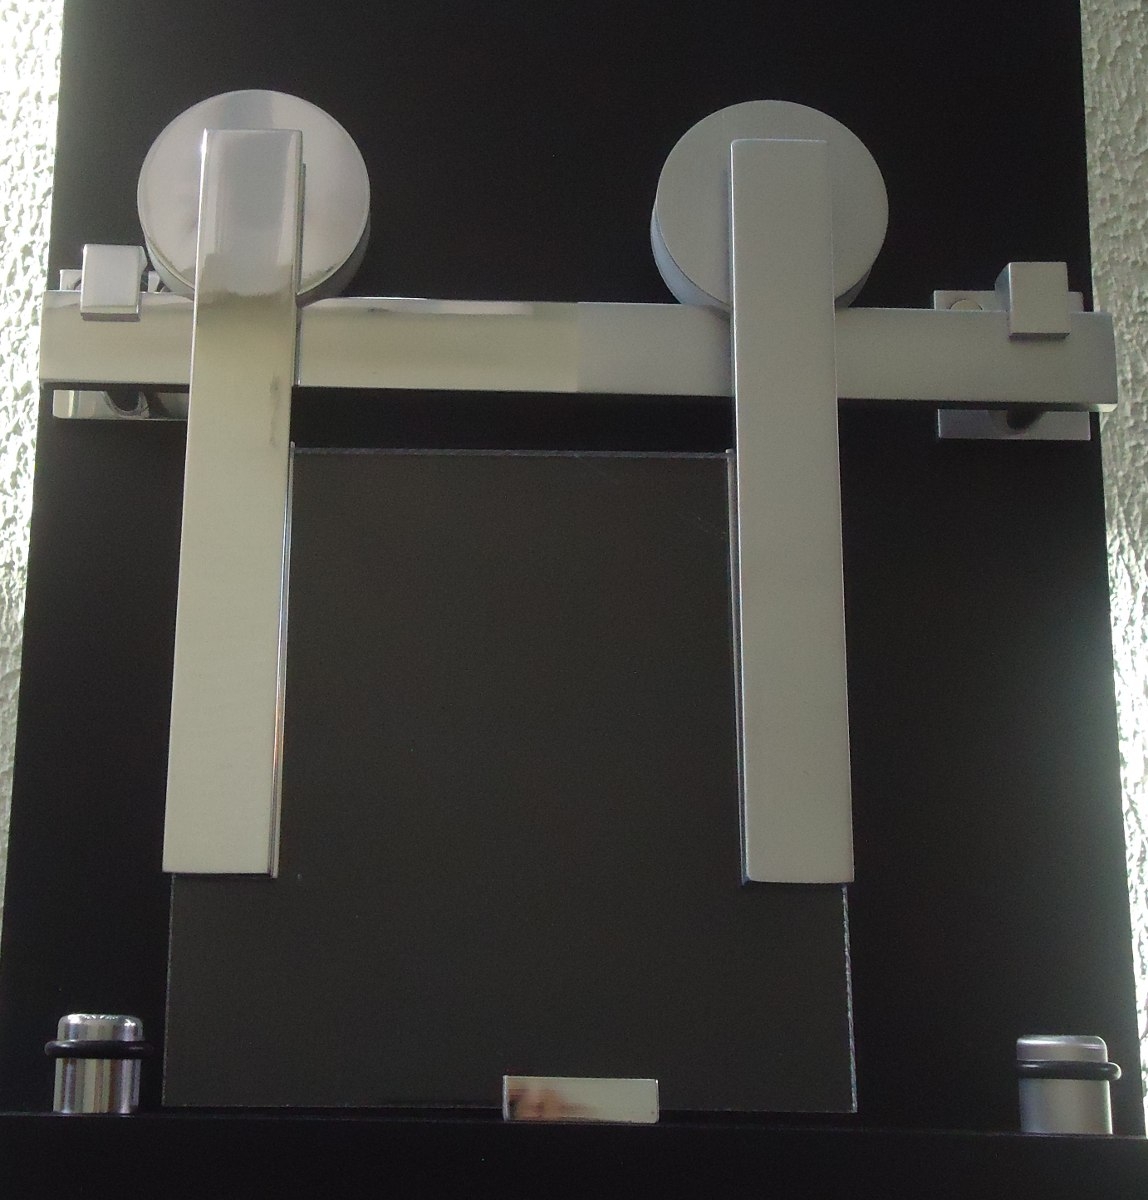 Kit Porta De Correr Roldana Aparente Para Porta De Vidro R$ 220 00  #5C4F47 1148 1200